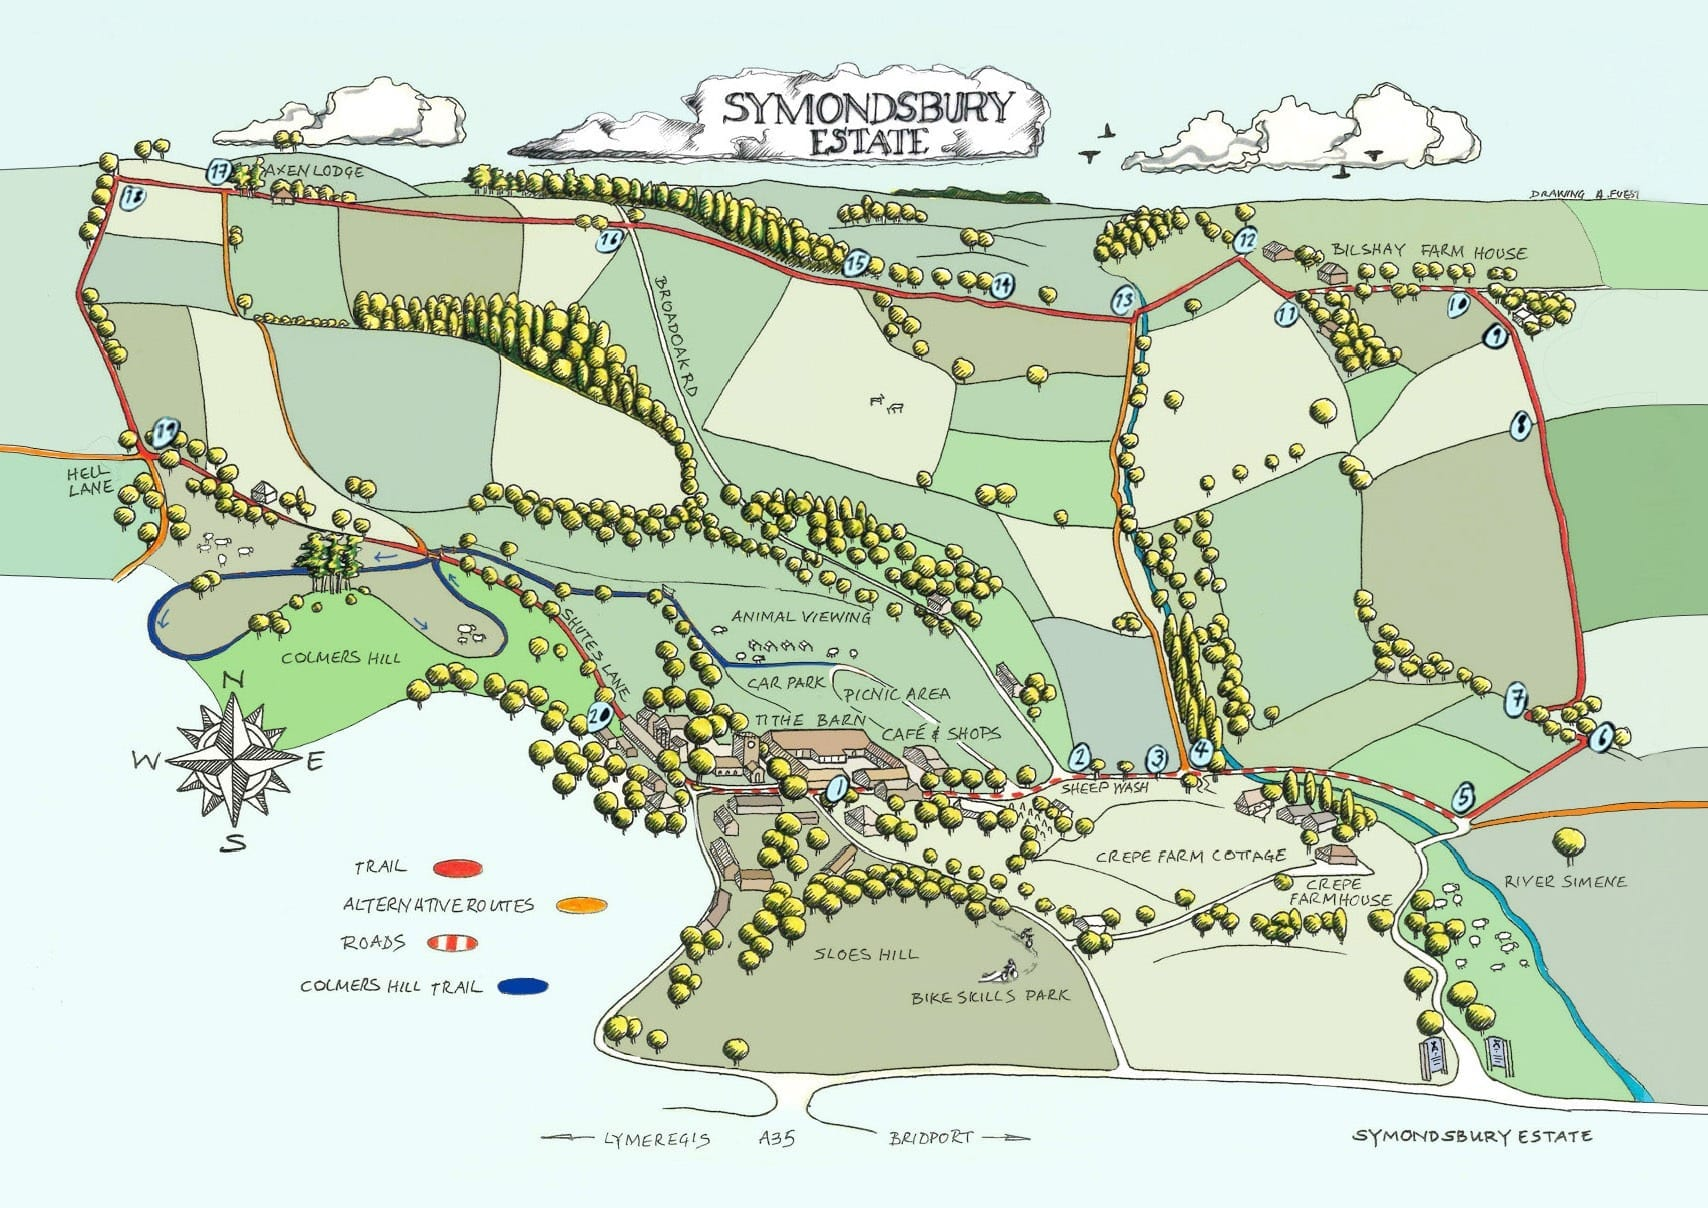 Symondsbury Estate Walking and Cycling Trail